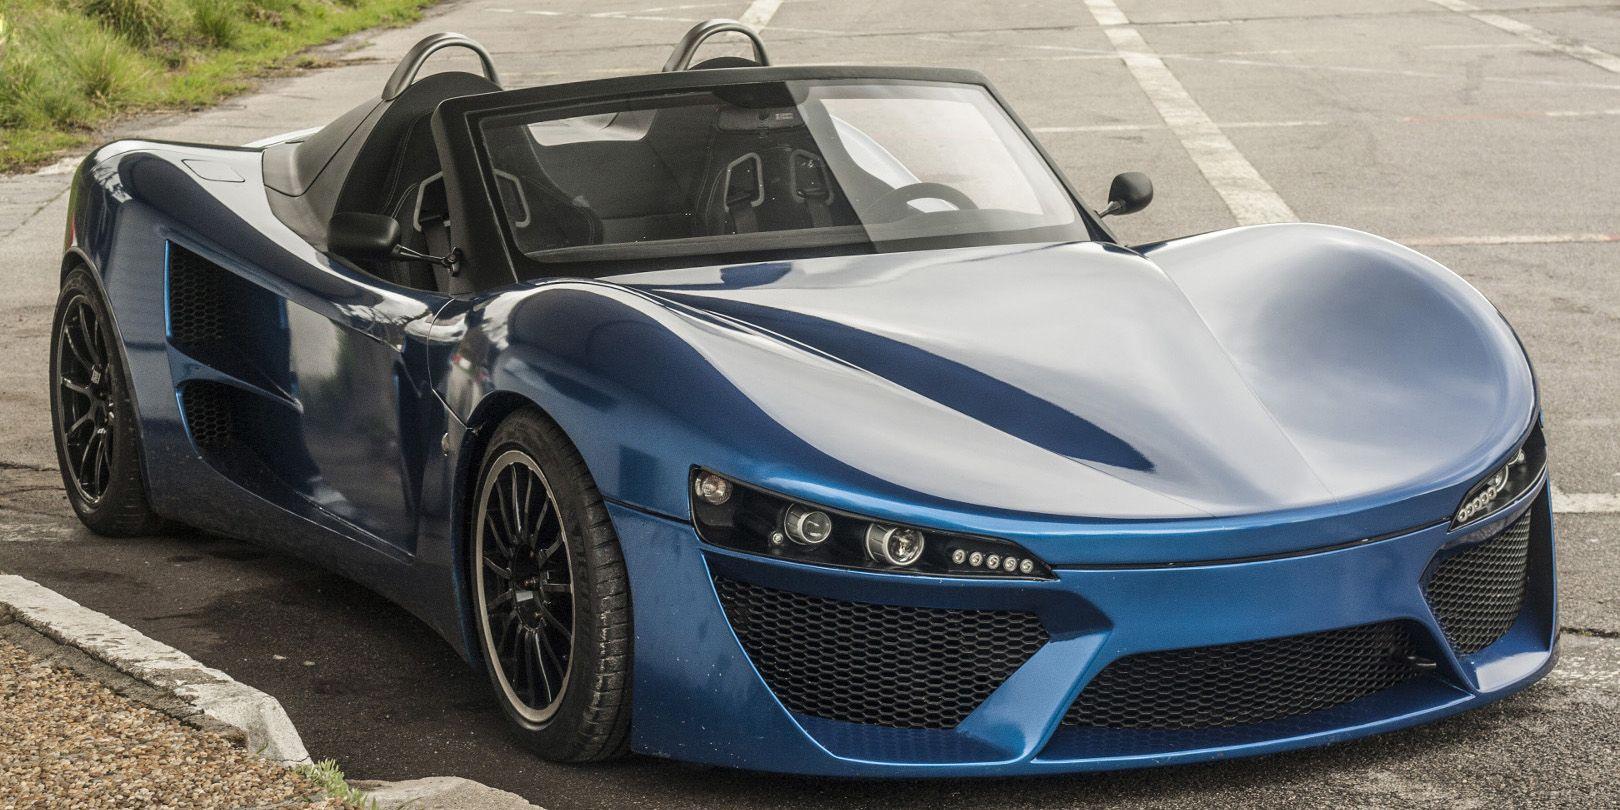 Adamastor portugal's latest sports car is the lightweight, bare-bones